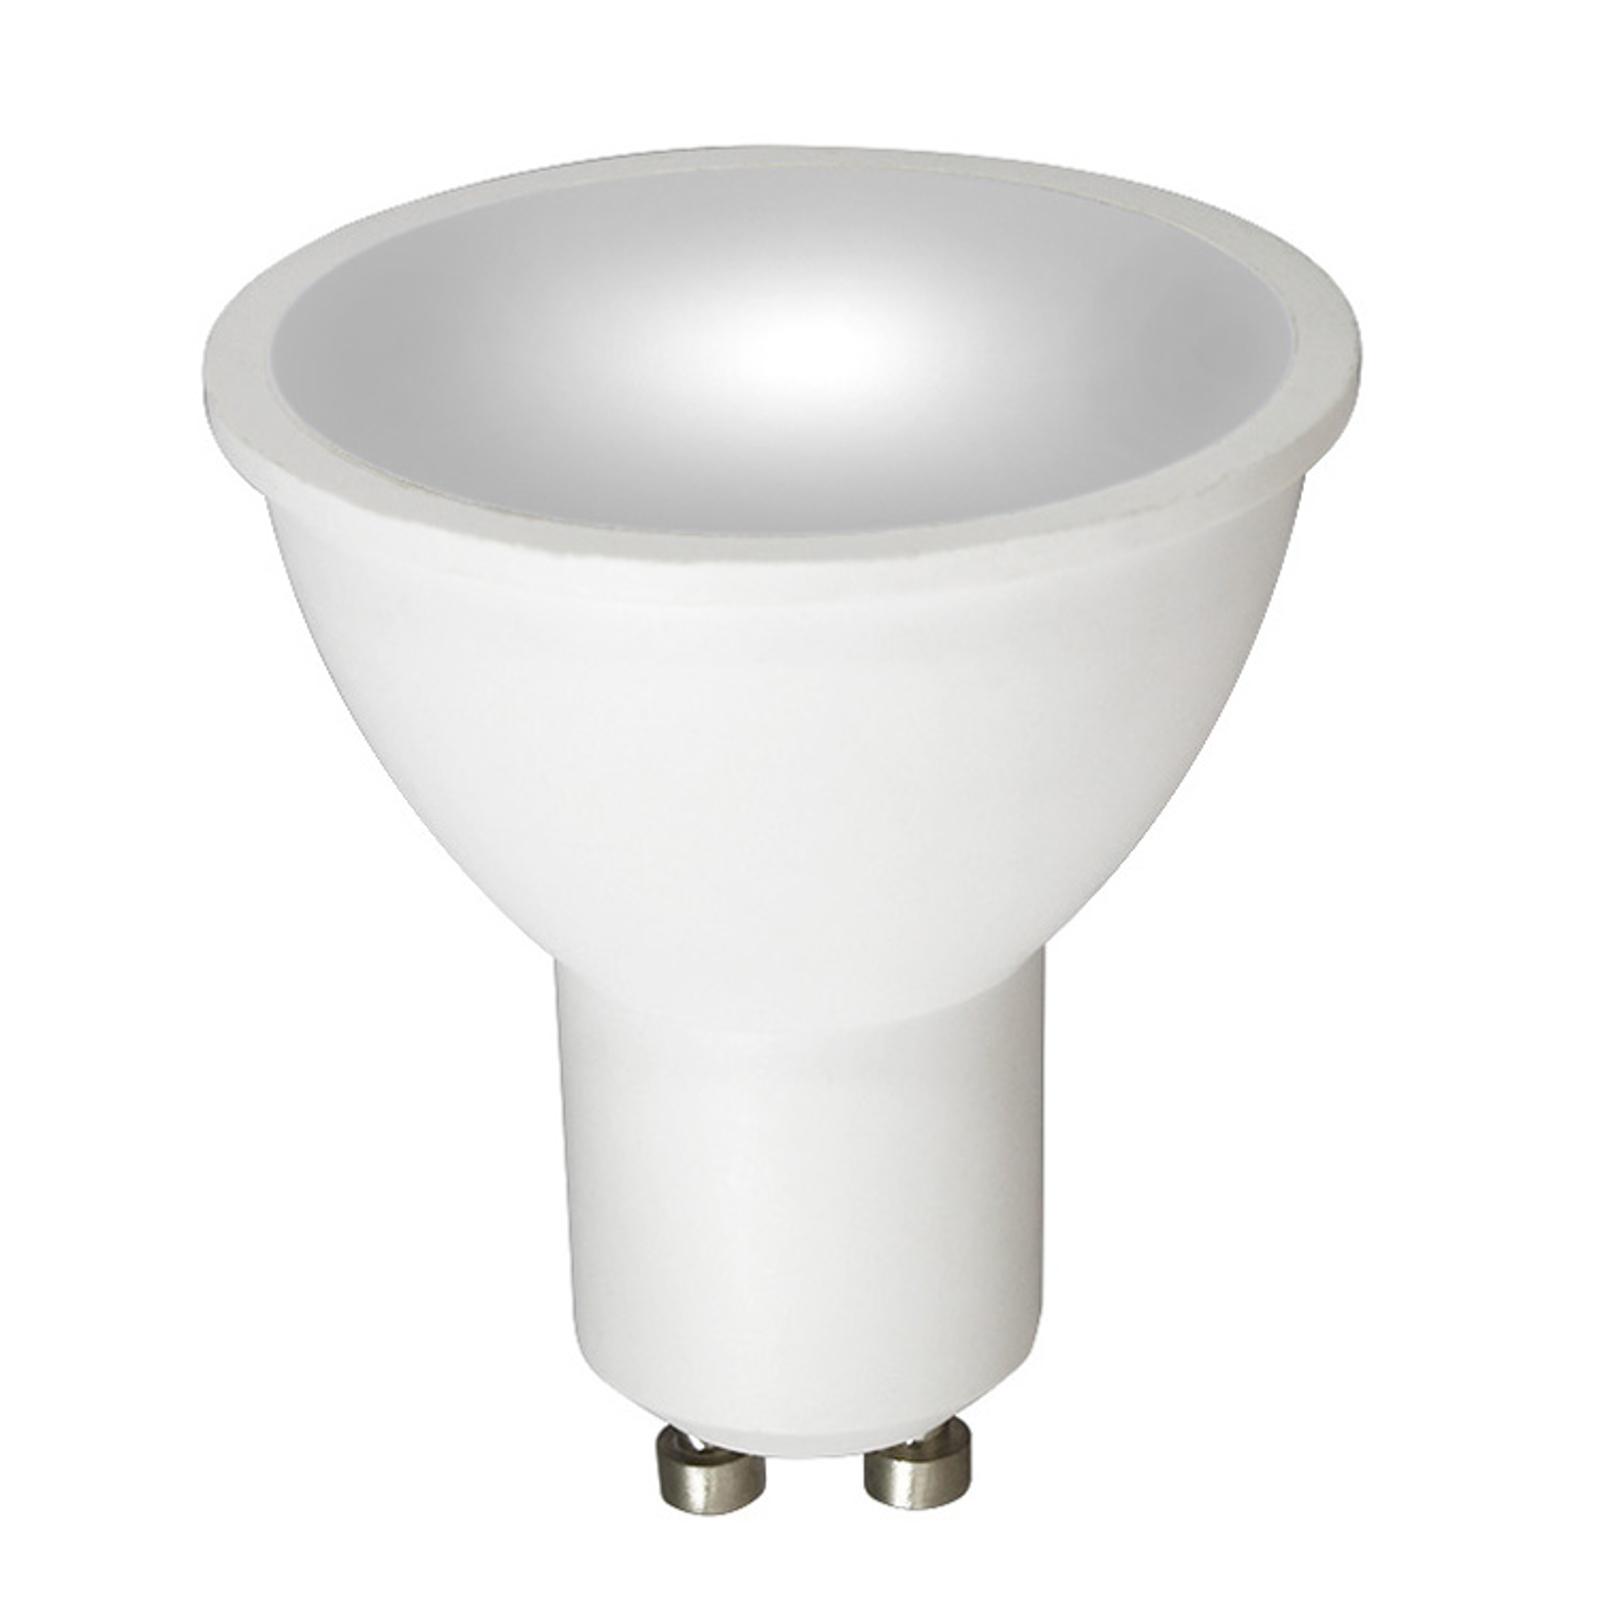 LED-Reflektor KADO GU10 7,5W 120° 5.000K